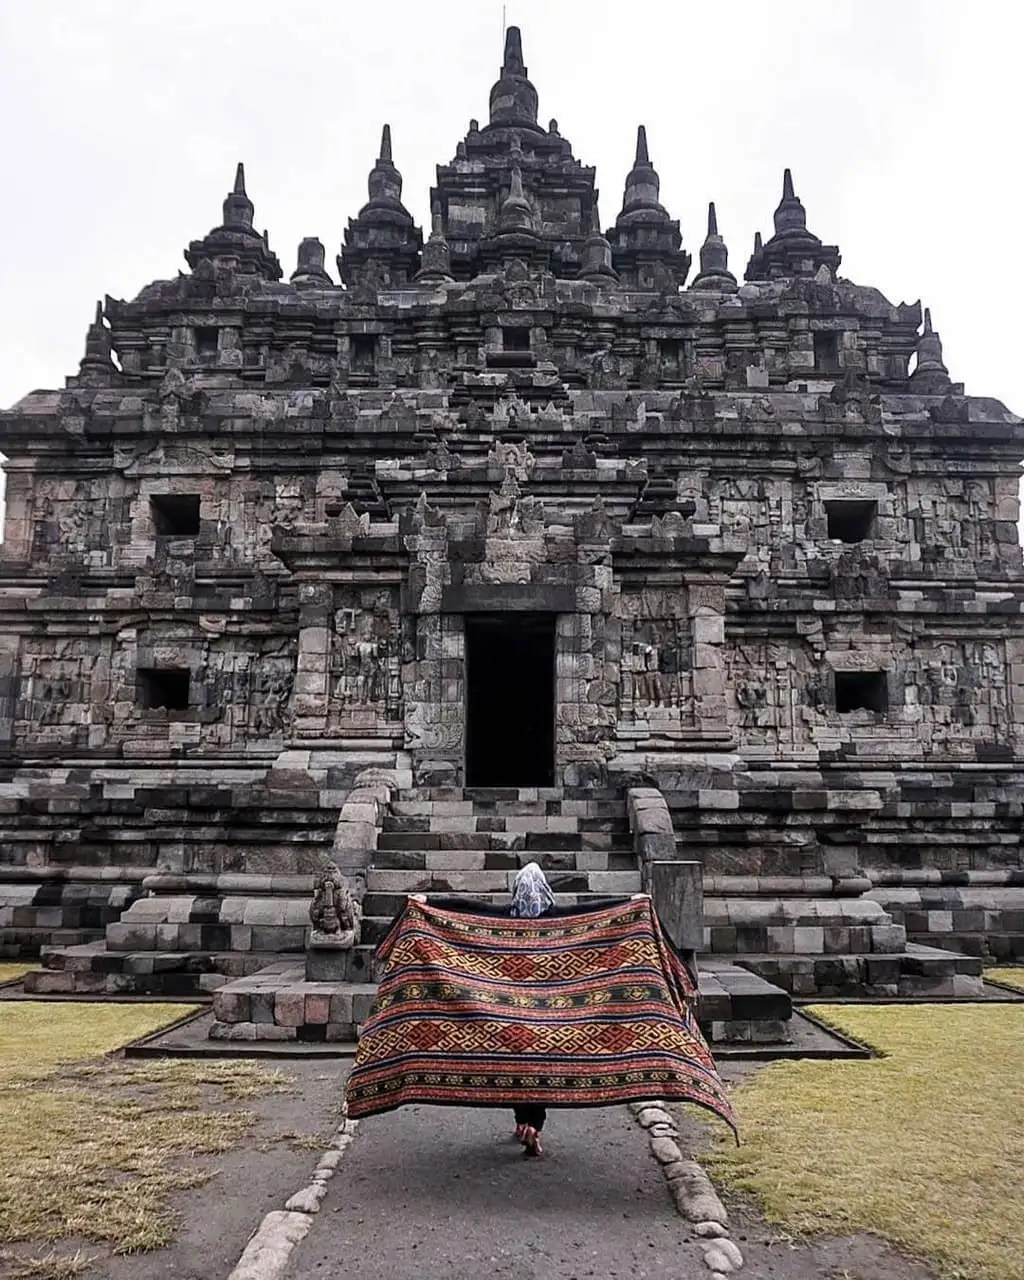 Nama Candi Di Indonesia : candi, indonesia, Candi, Indonesia, Punya, Kisah, Sejarah, Menarik